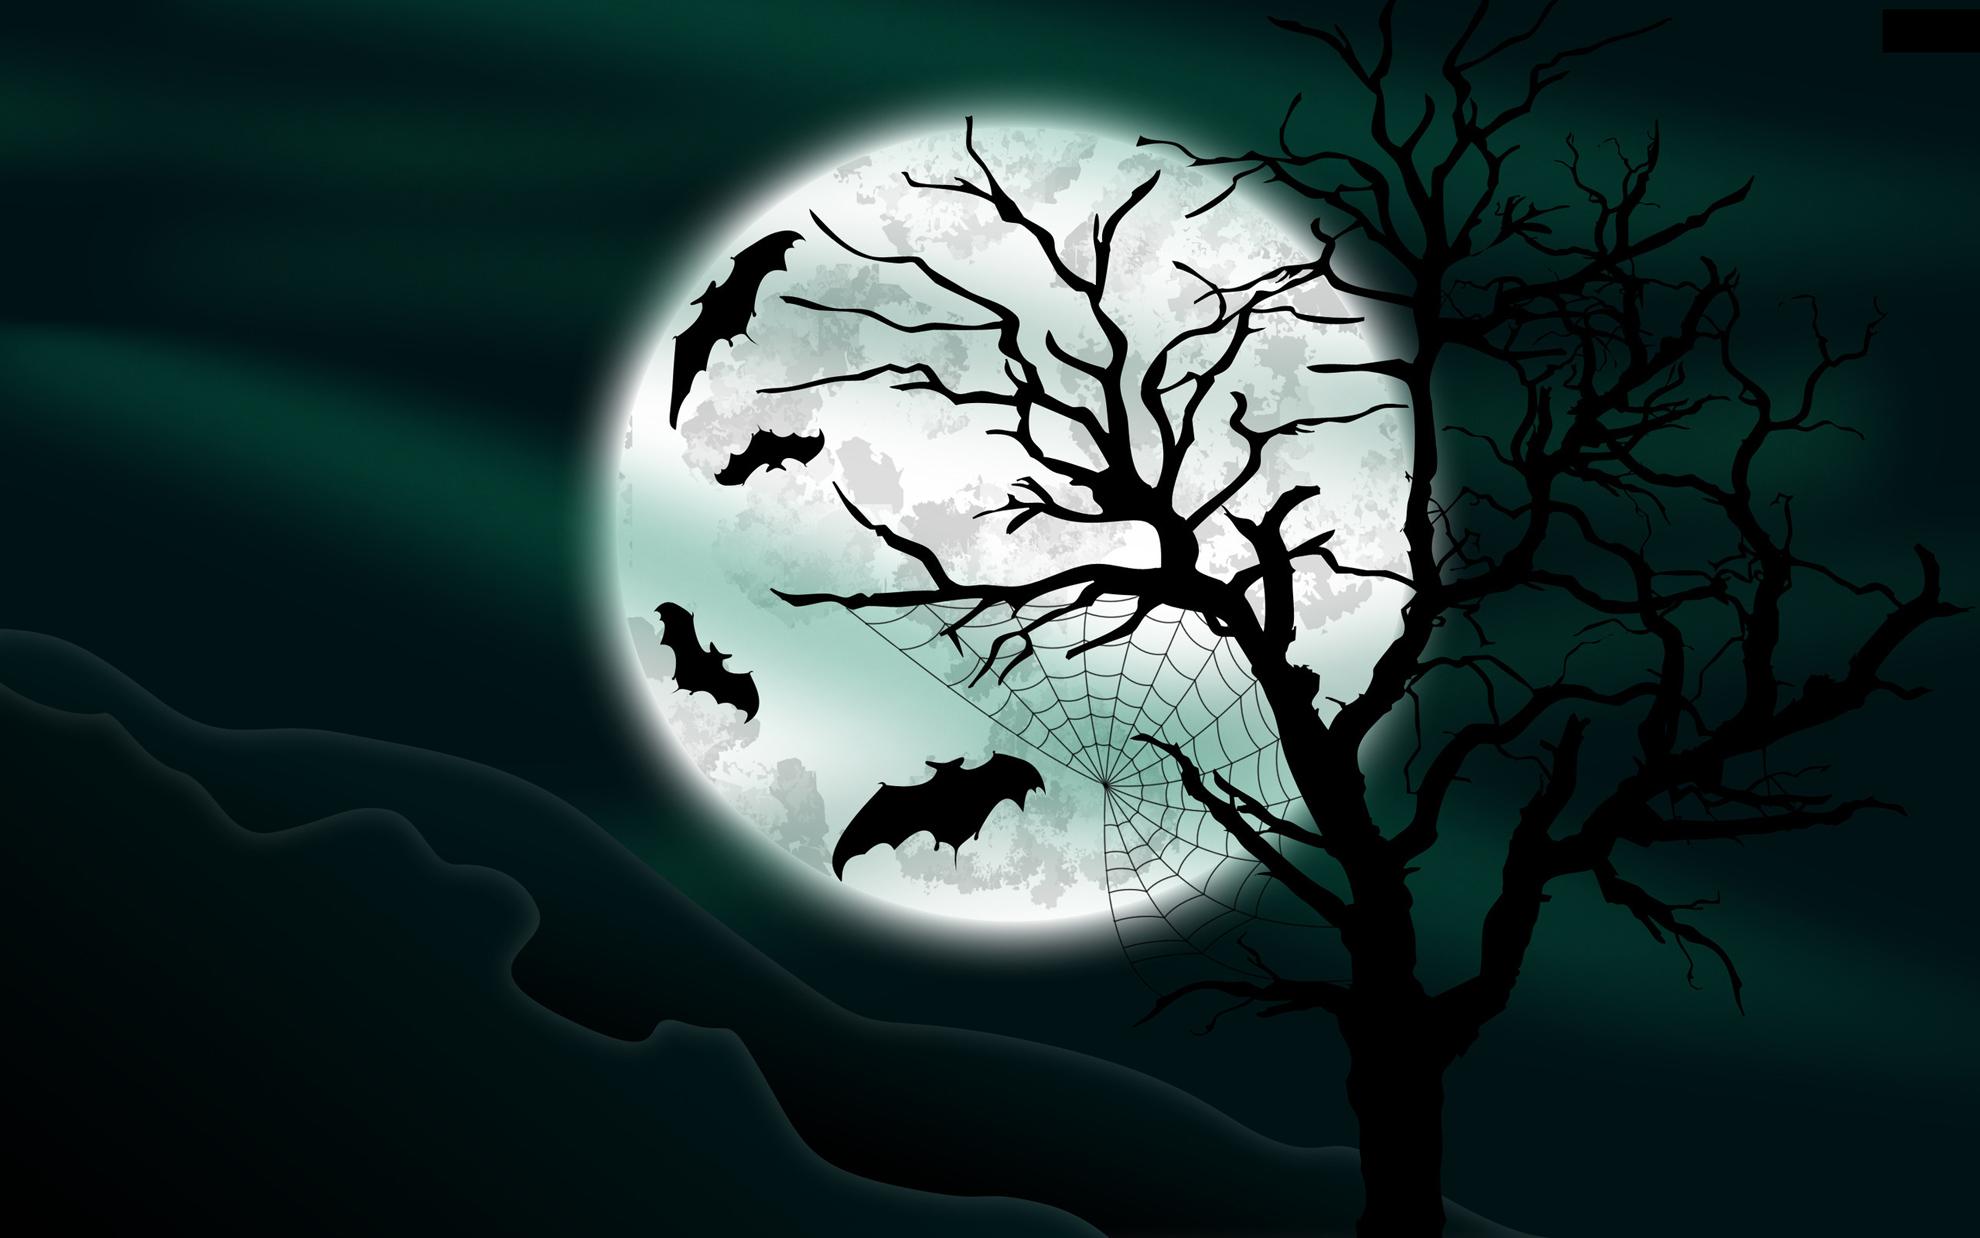 Hd Wallpapers Assassins Creed Halloween Wallpapers Halloween Fondos Hd Gratis